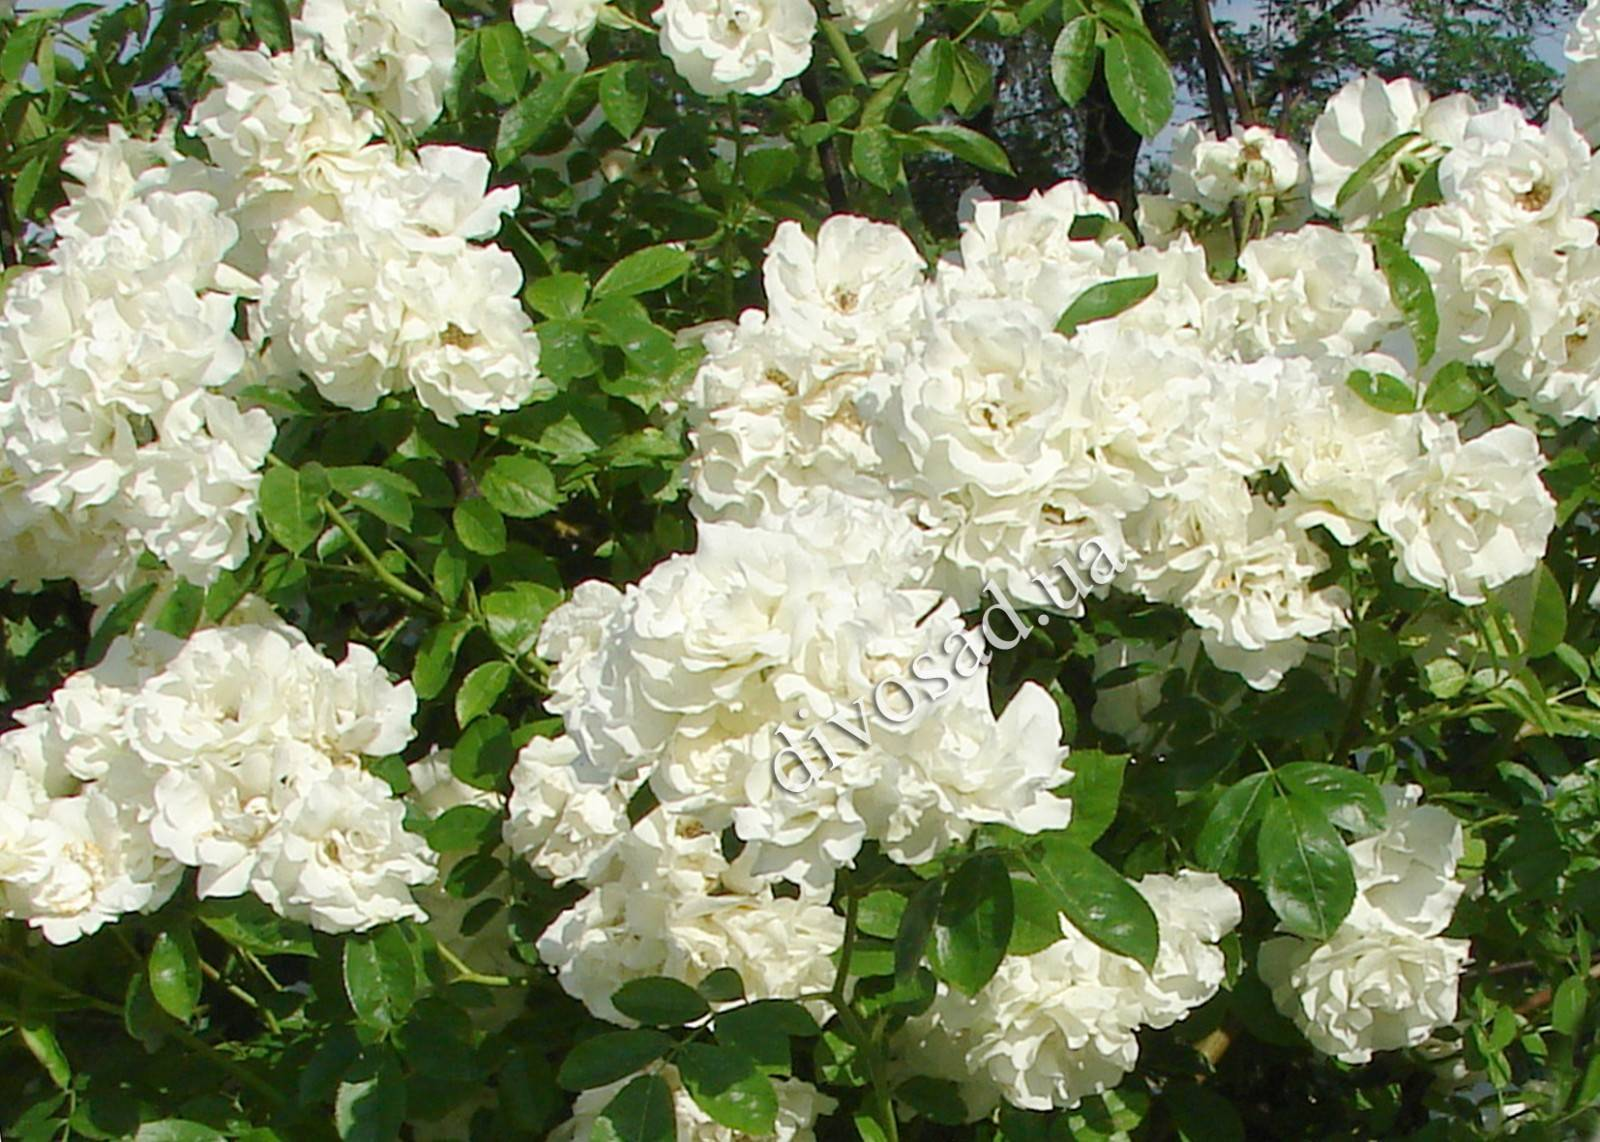 плетистая роза кримсон рамблер фото одно самых популярных